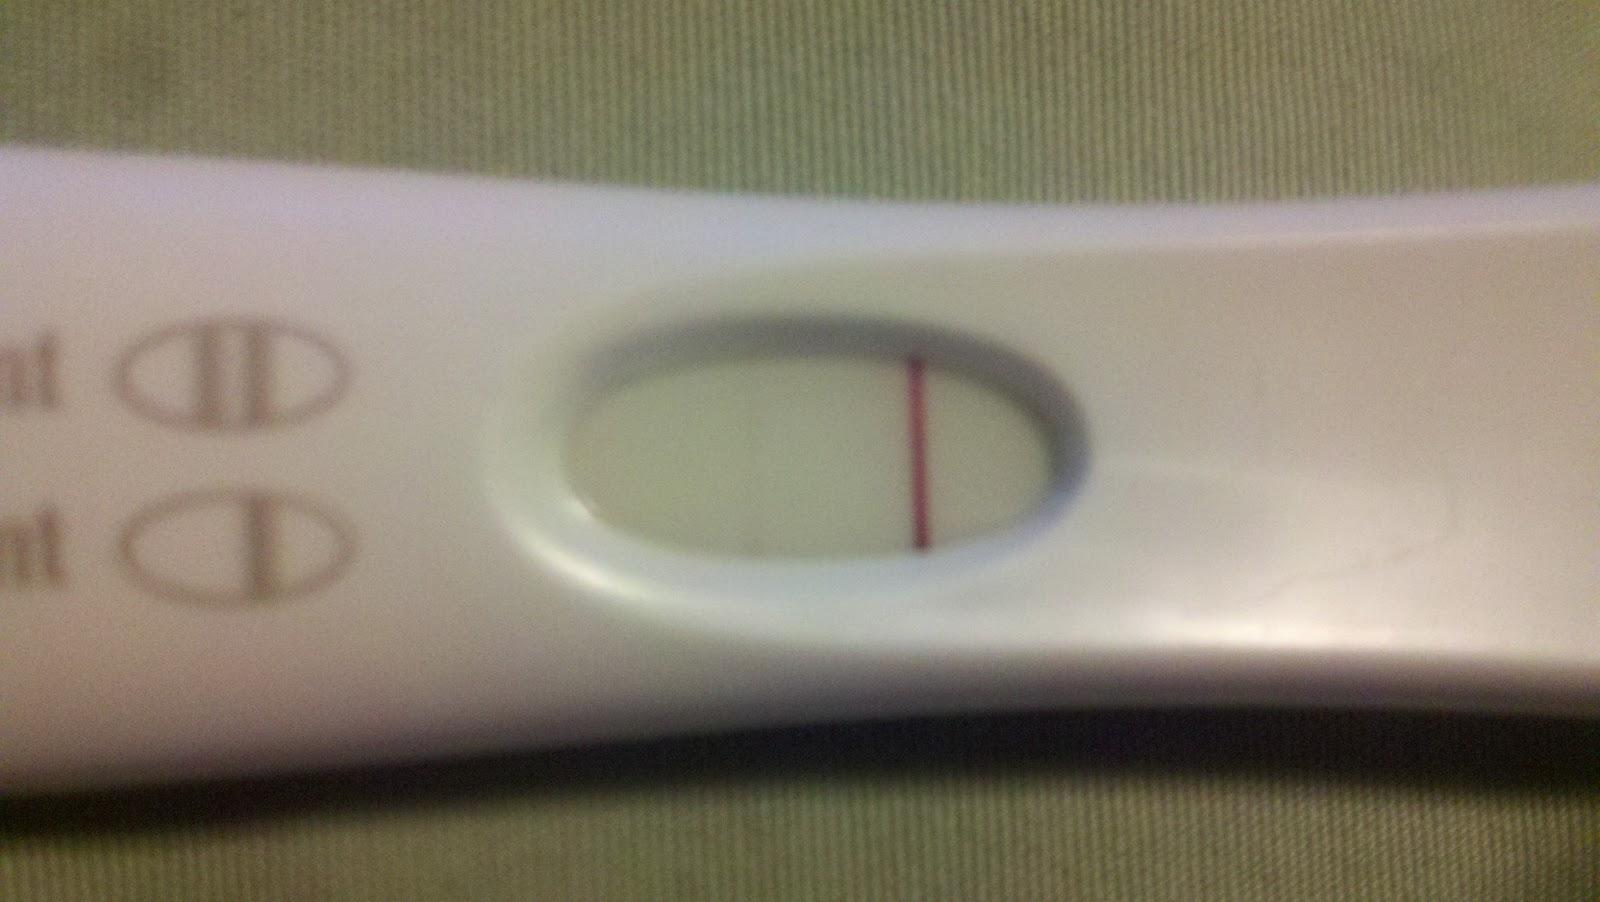 Pregnancy Archives - A Little CrunchyA Little Crunchy